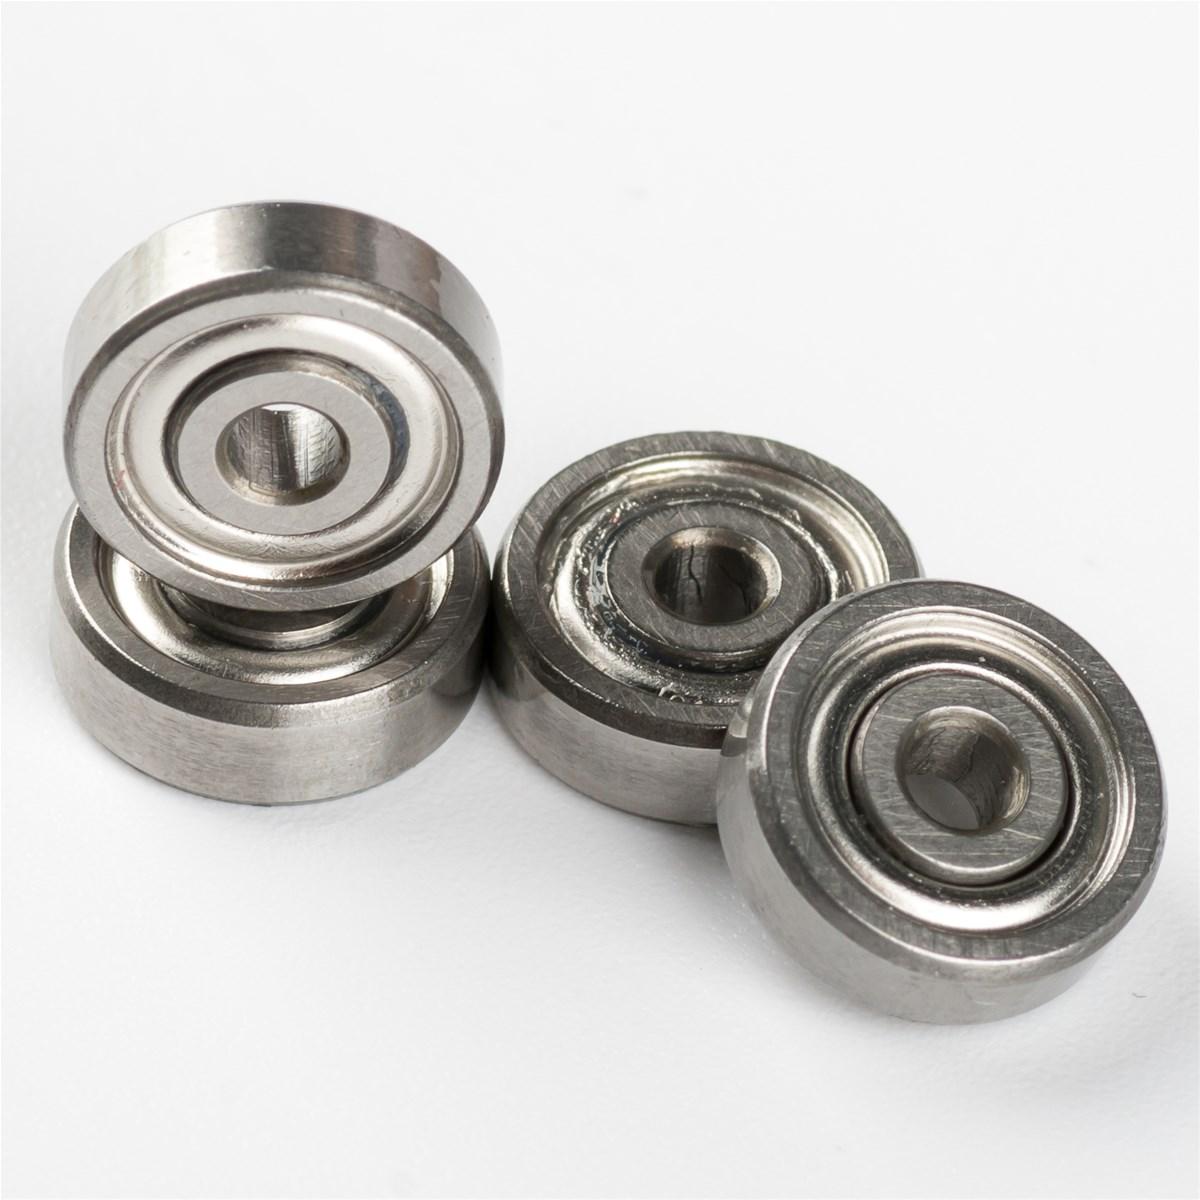 high precision low noise Miniature deep groove ball bearing 692zz